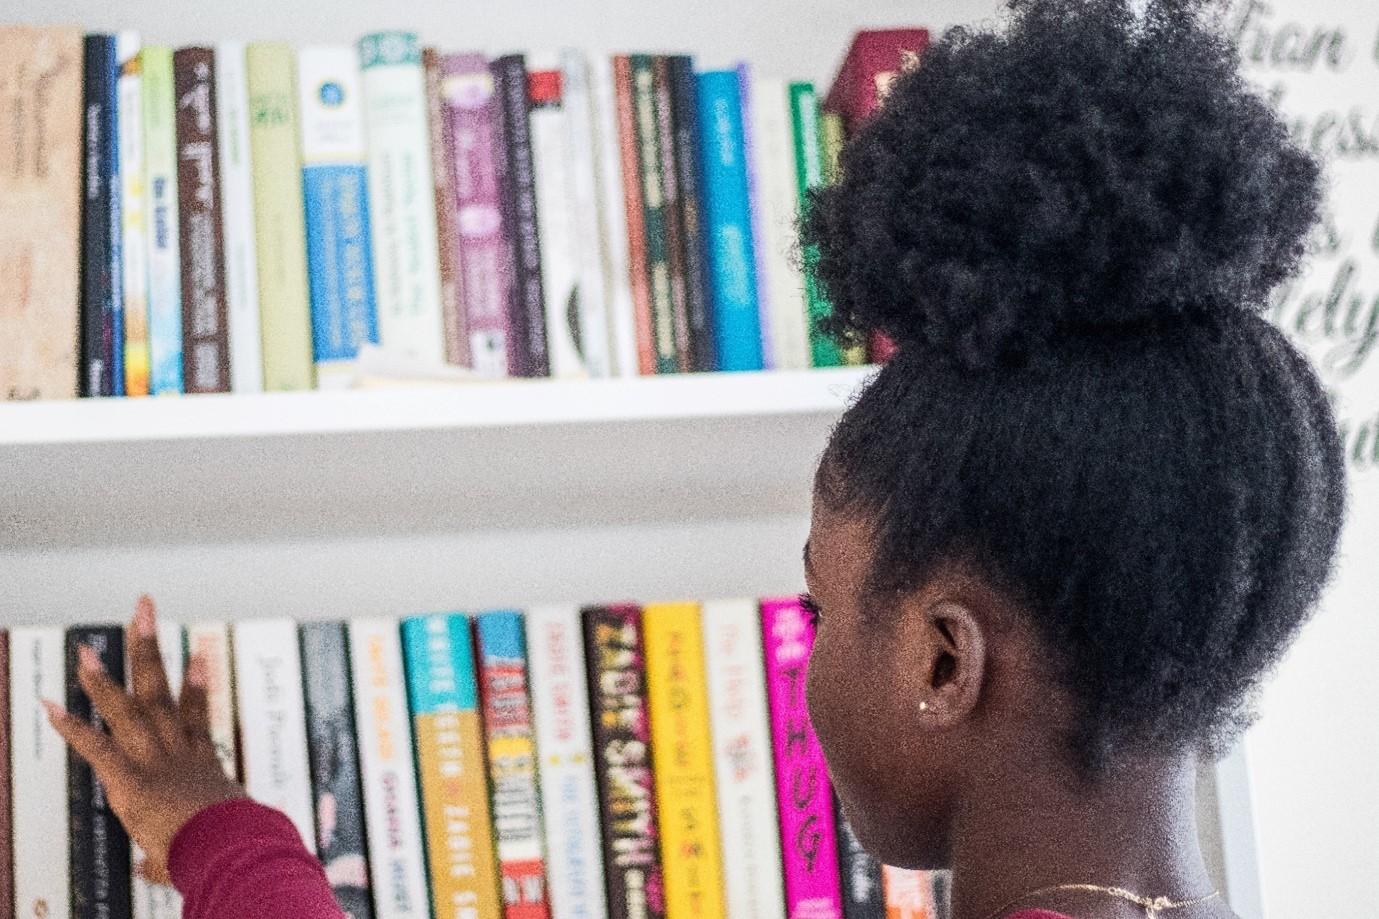 Display books to encourage reading